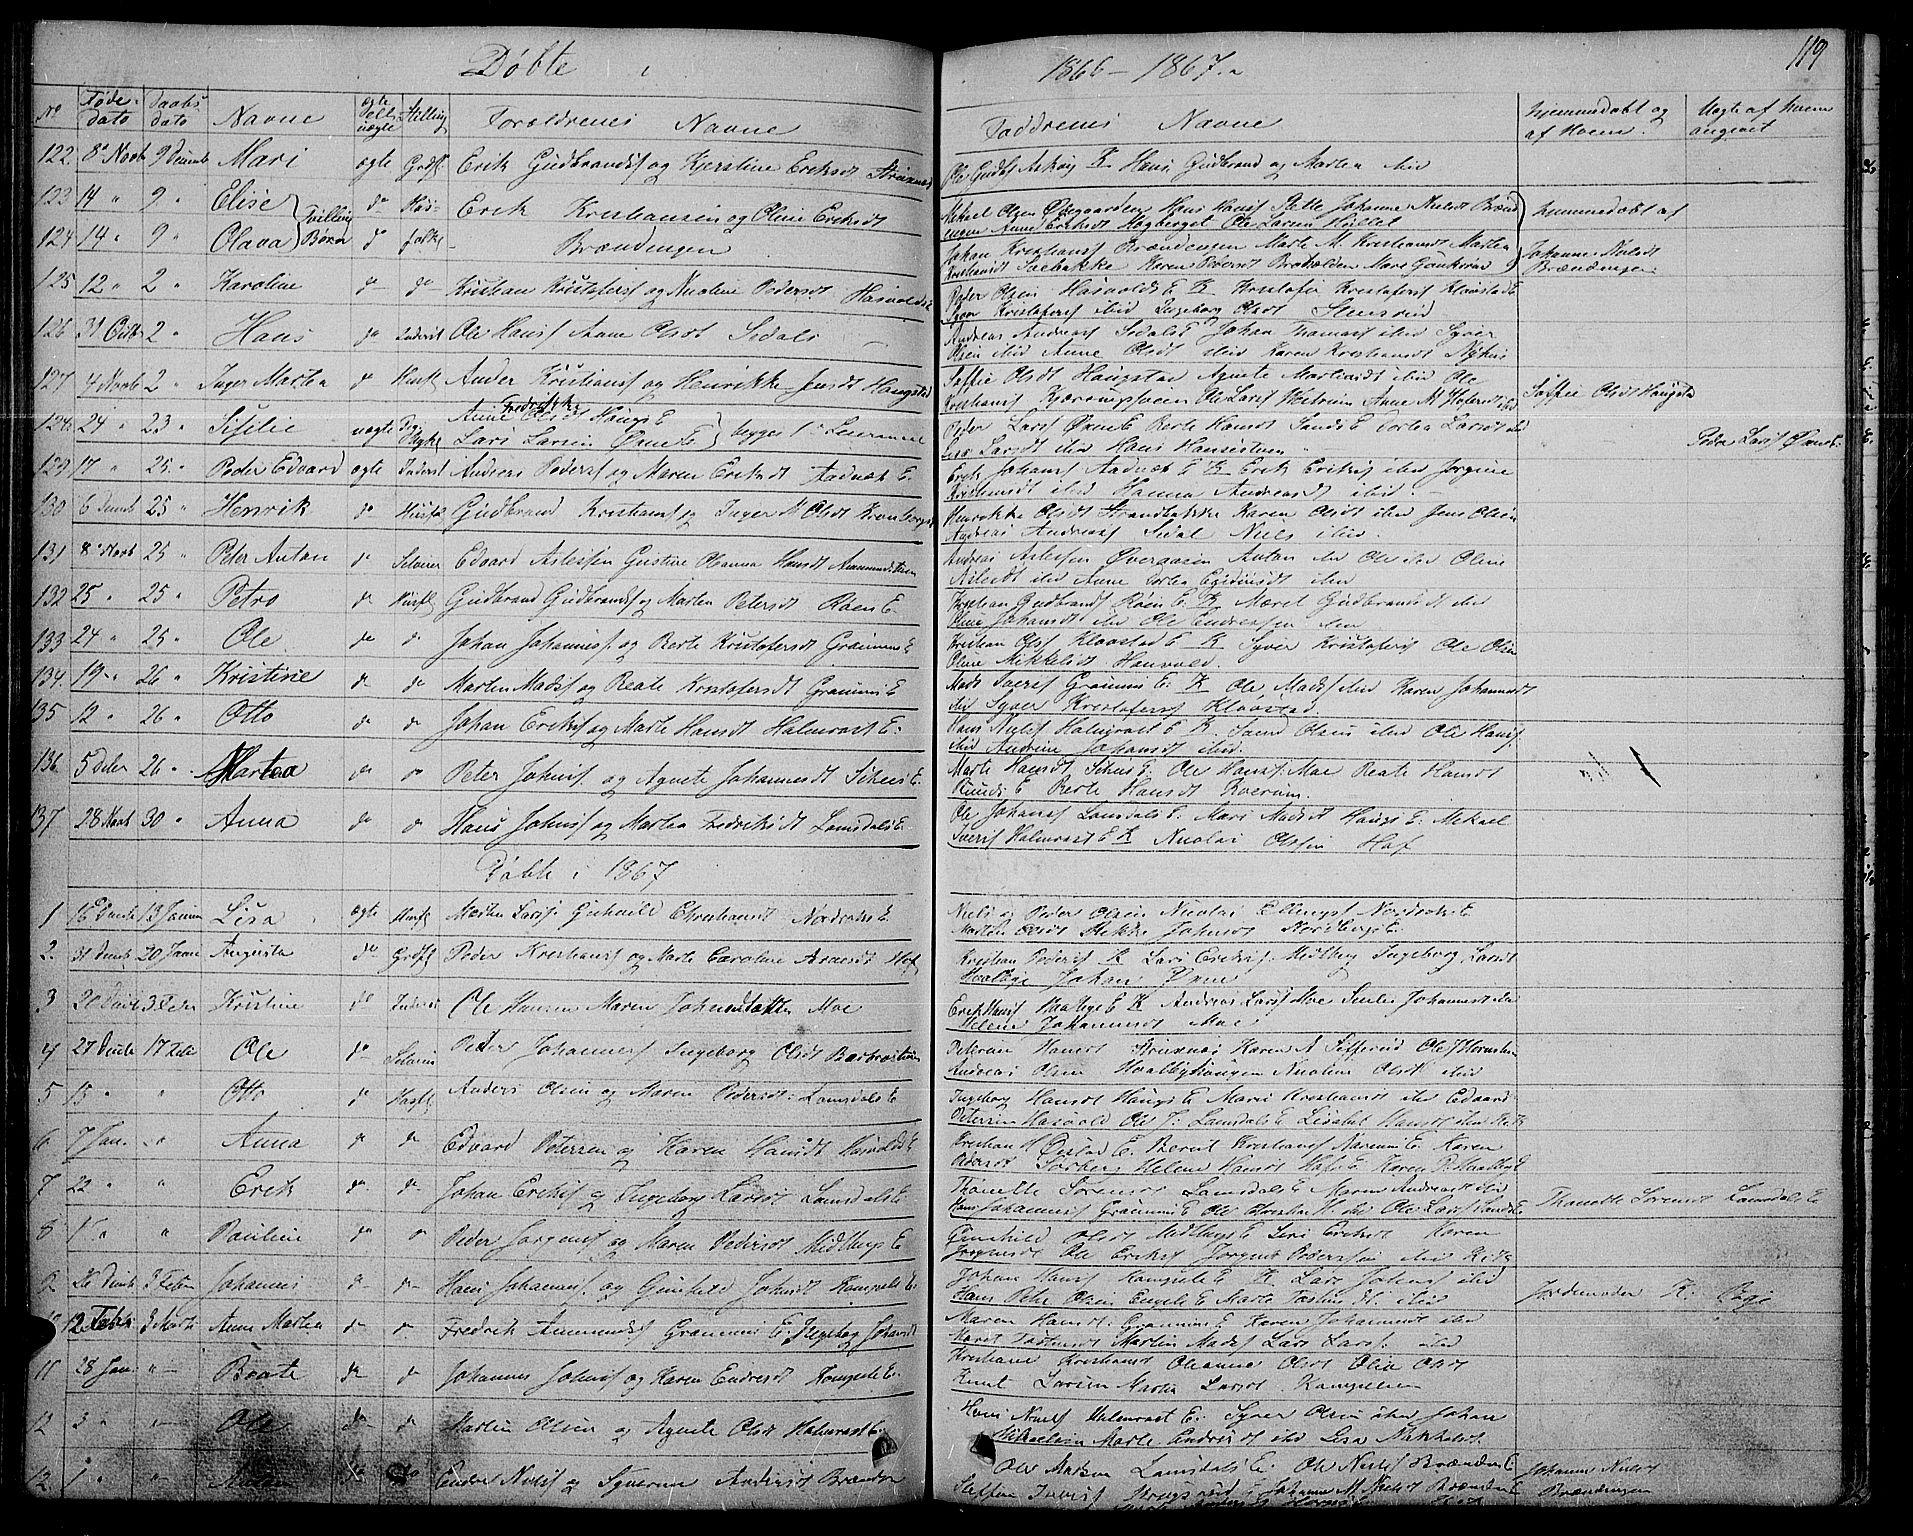 SAH, Søndre Land prestekontor, L/L0001: Klokkerbok nr. 1, 1849-1883, s. 119